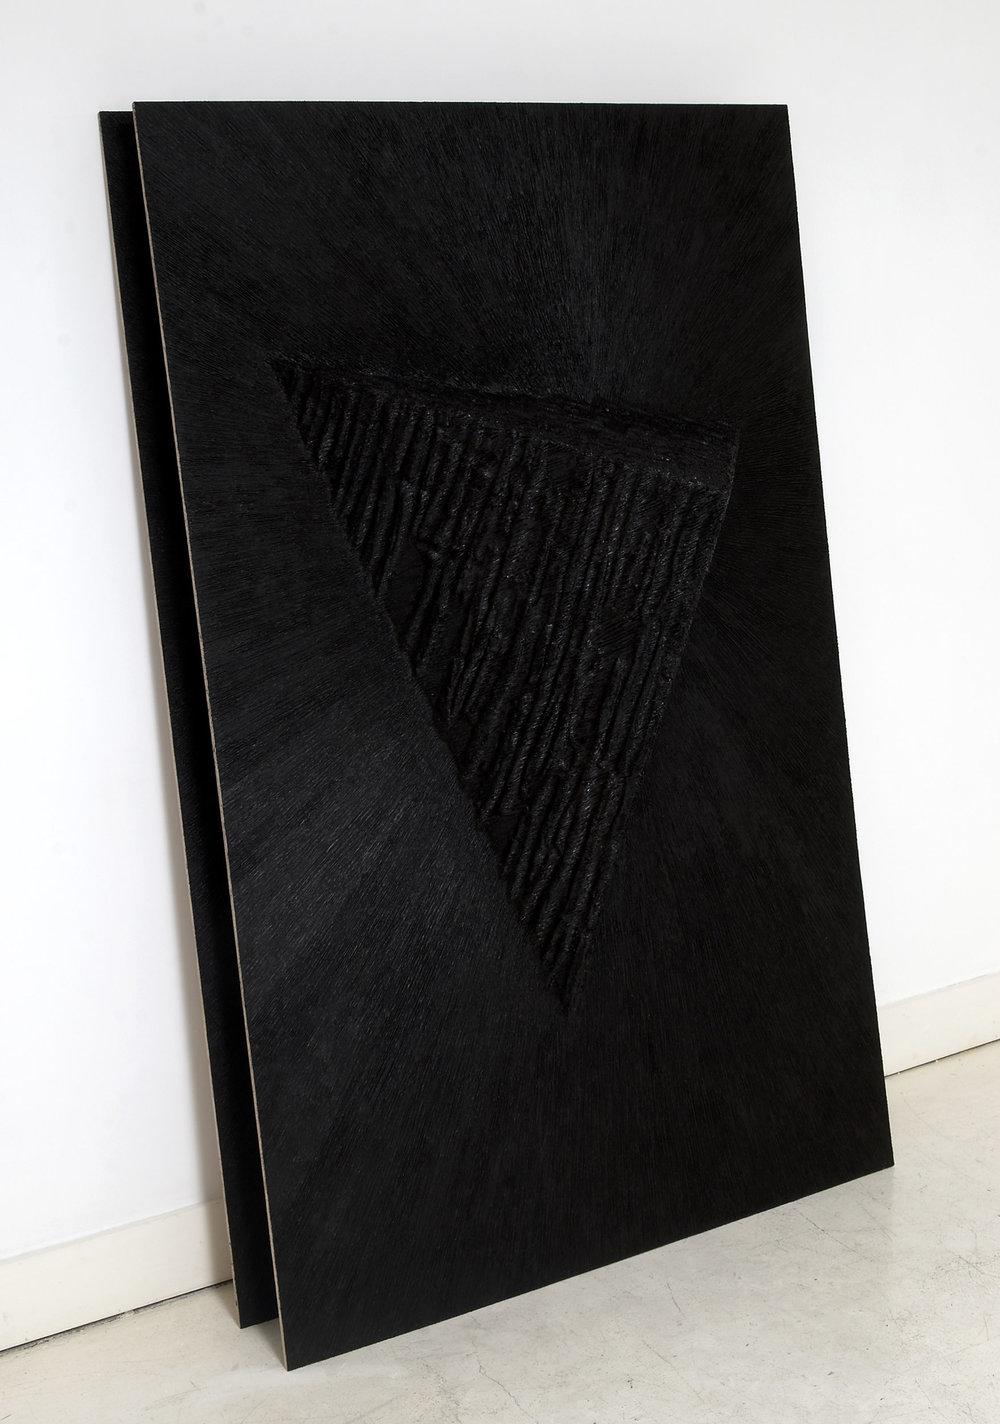 Leaning-Sculpture-&-Leaning-Sculpture-[Replica],-Board,-screws,-paper-maché,-black-board-paint,-acrylic-paint,-gel-medium,-both;-195.jpg